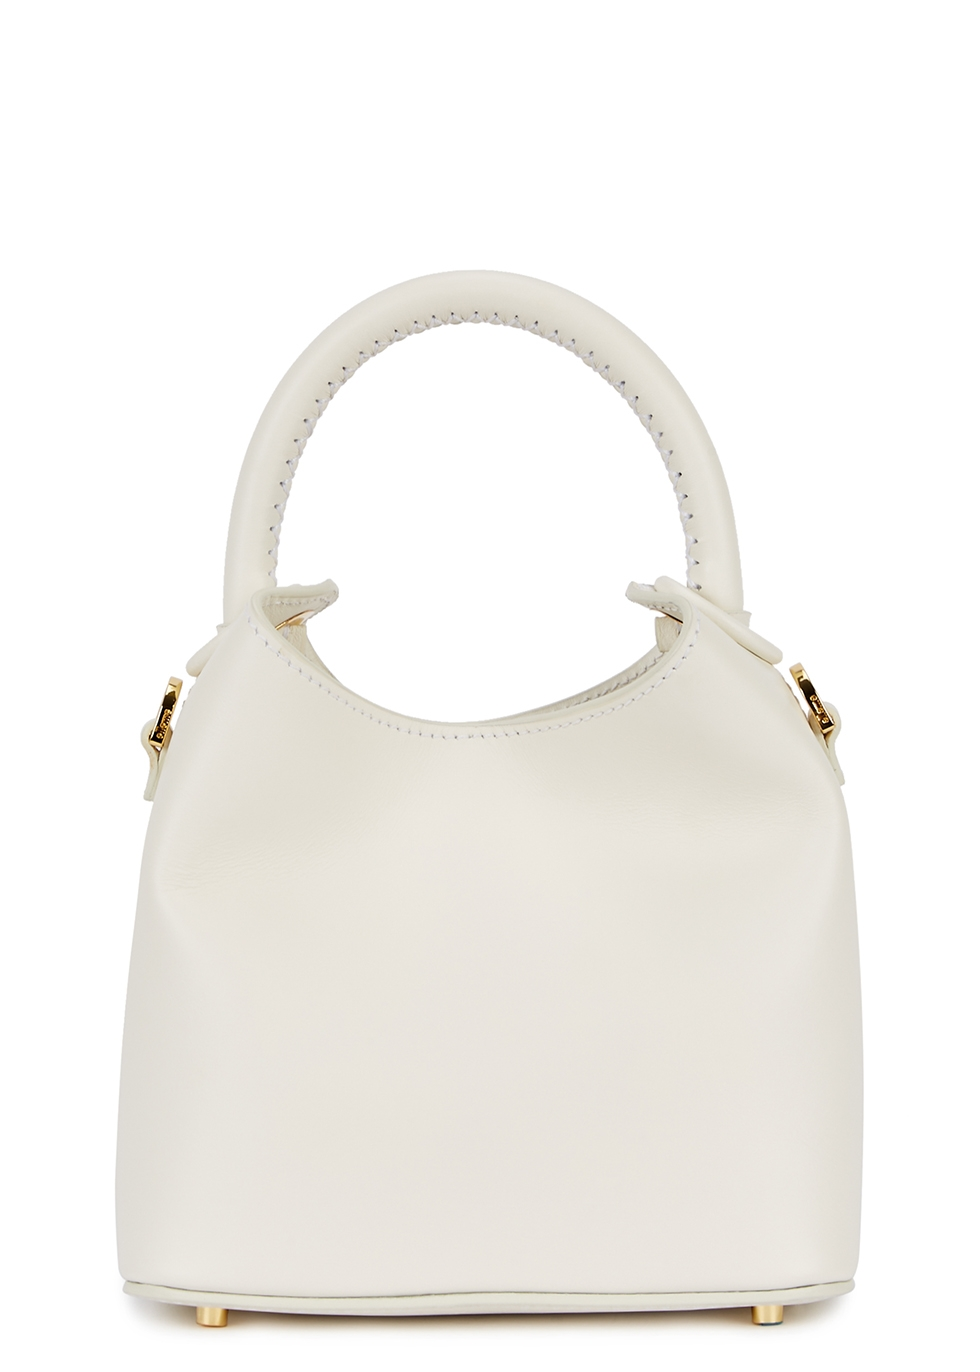 ELLEME Madeleine Mini Leather Cross-Body Bag in White